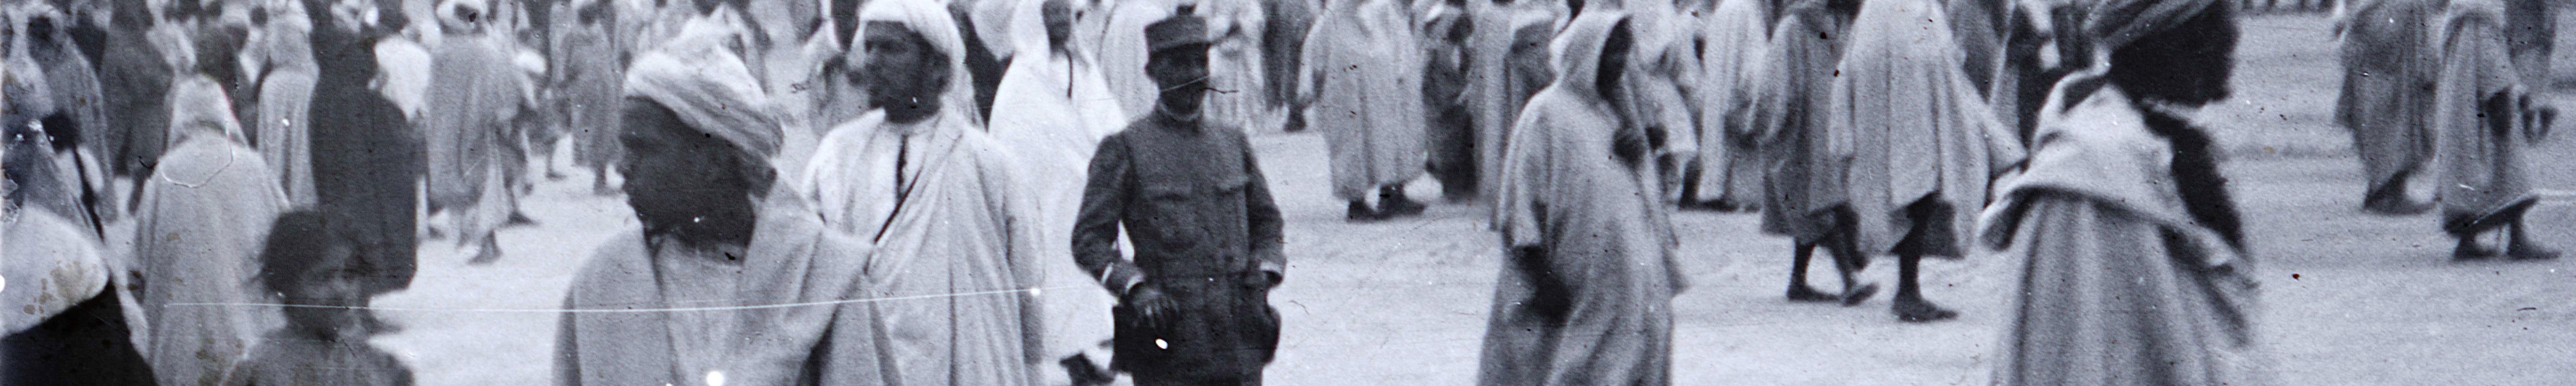 Maroc 1914-1916